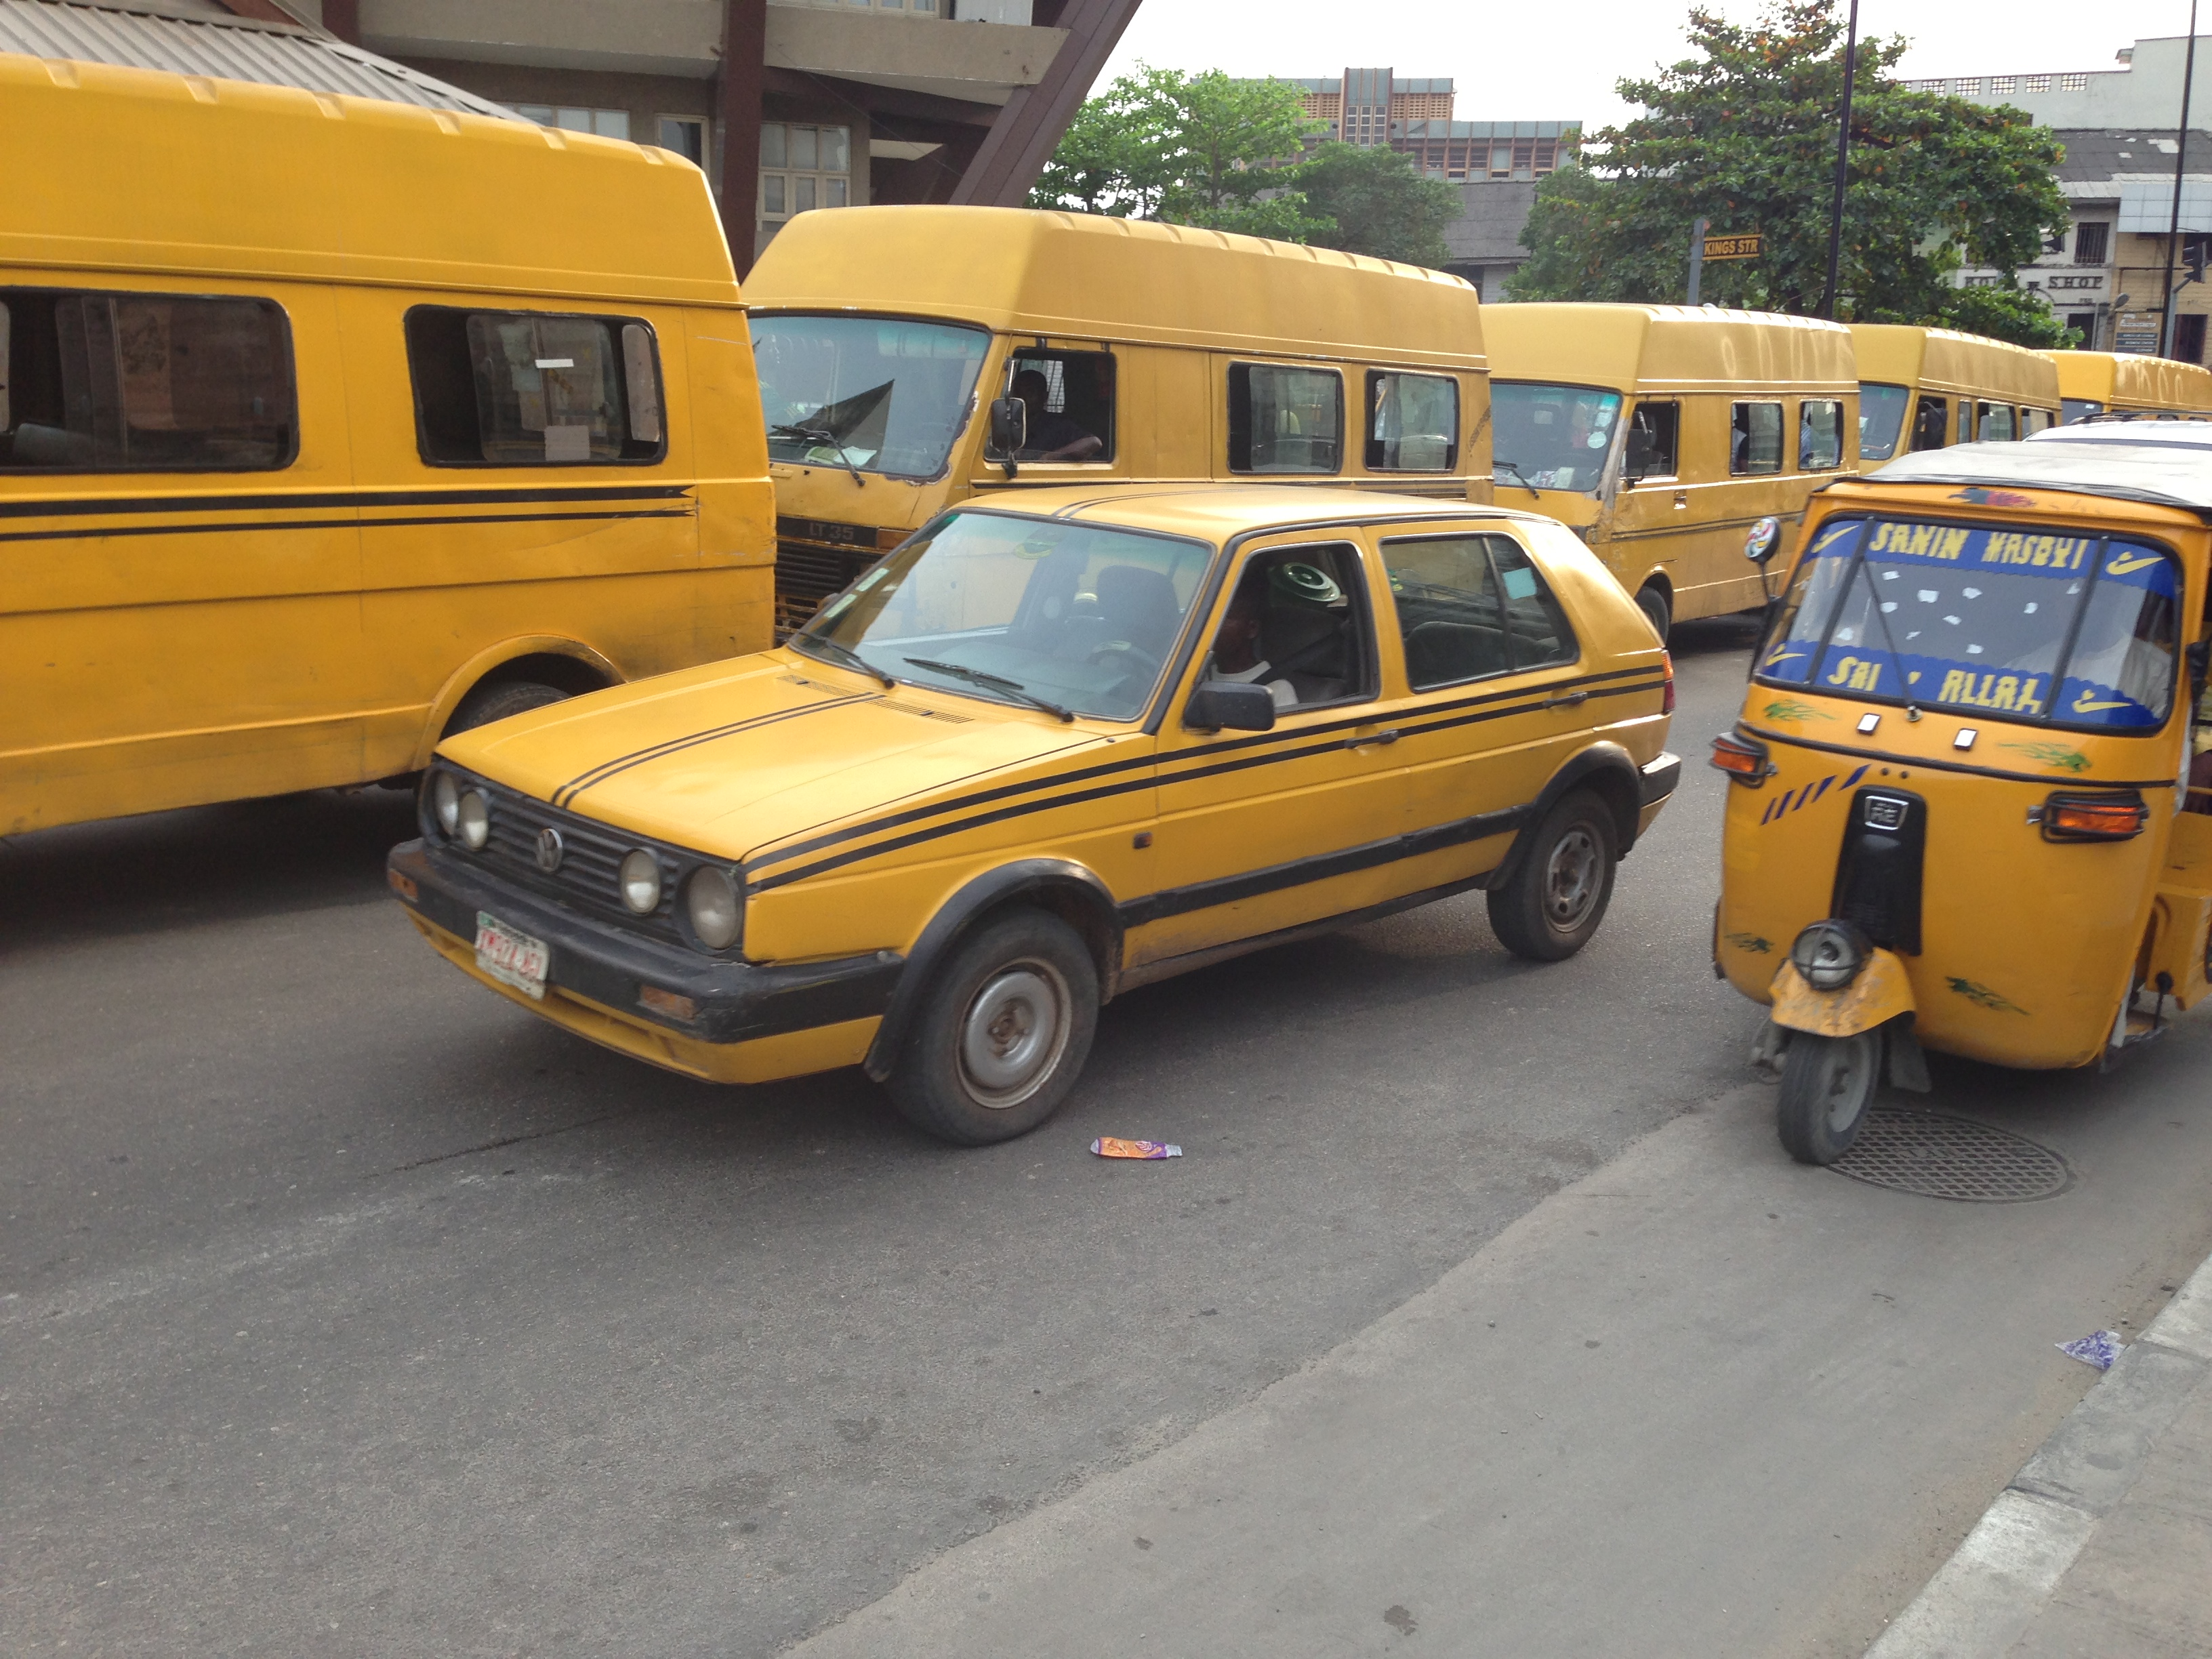 "<img src=http://""Lagos_Public_Transport.jpg""?w=233&h=175 alt=""Lagos Public Transport"">"